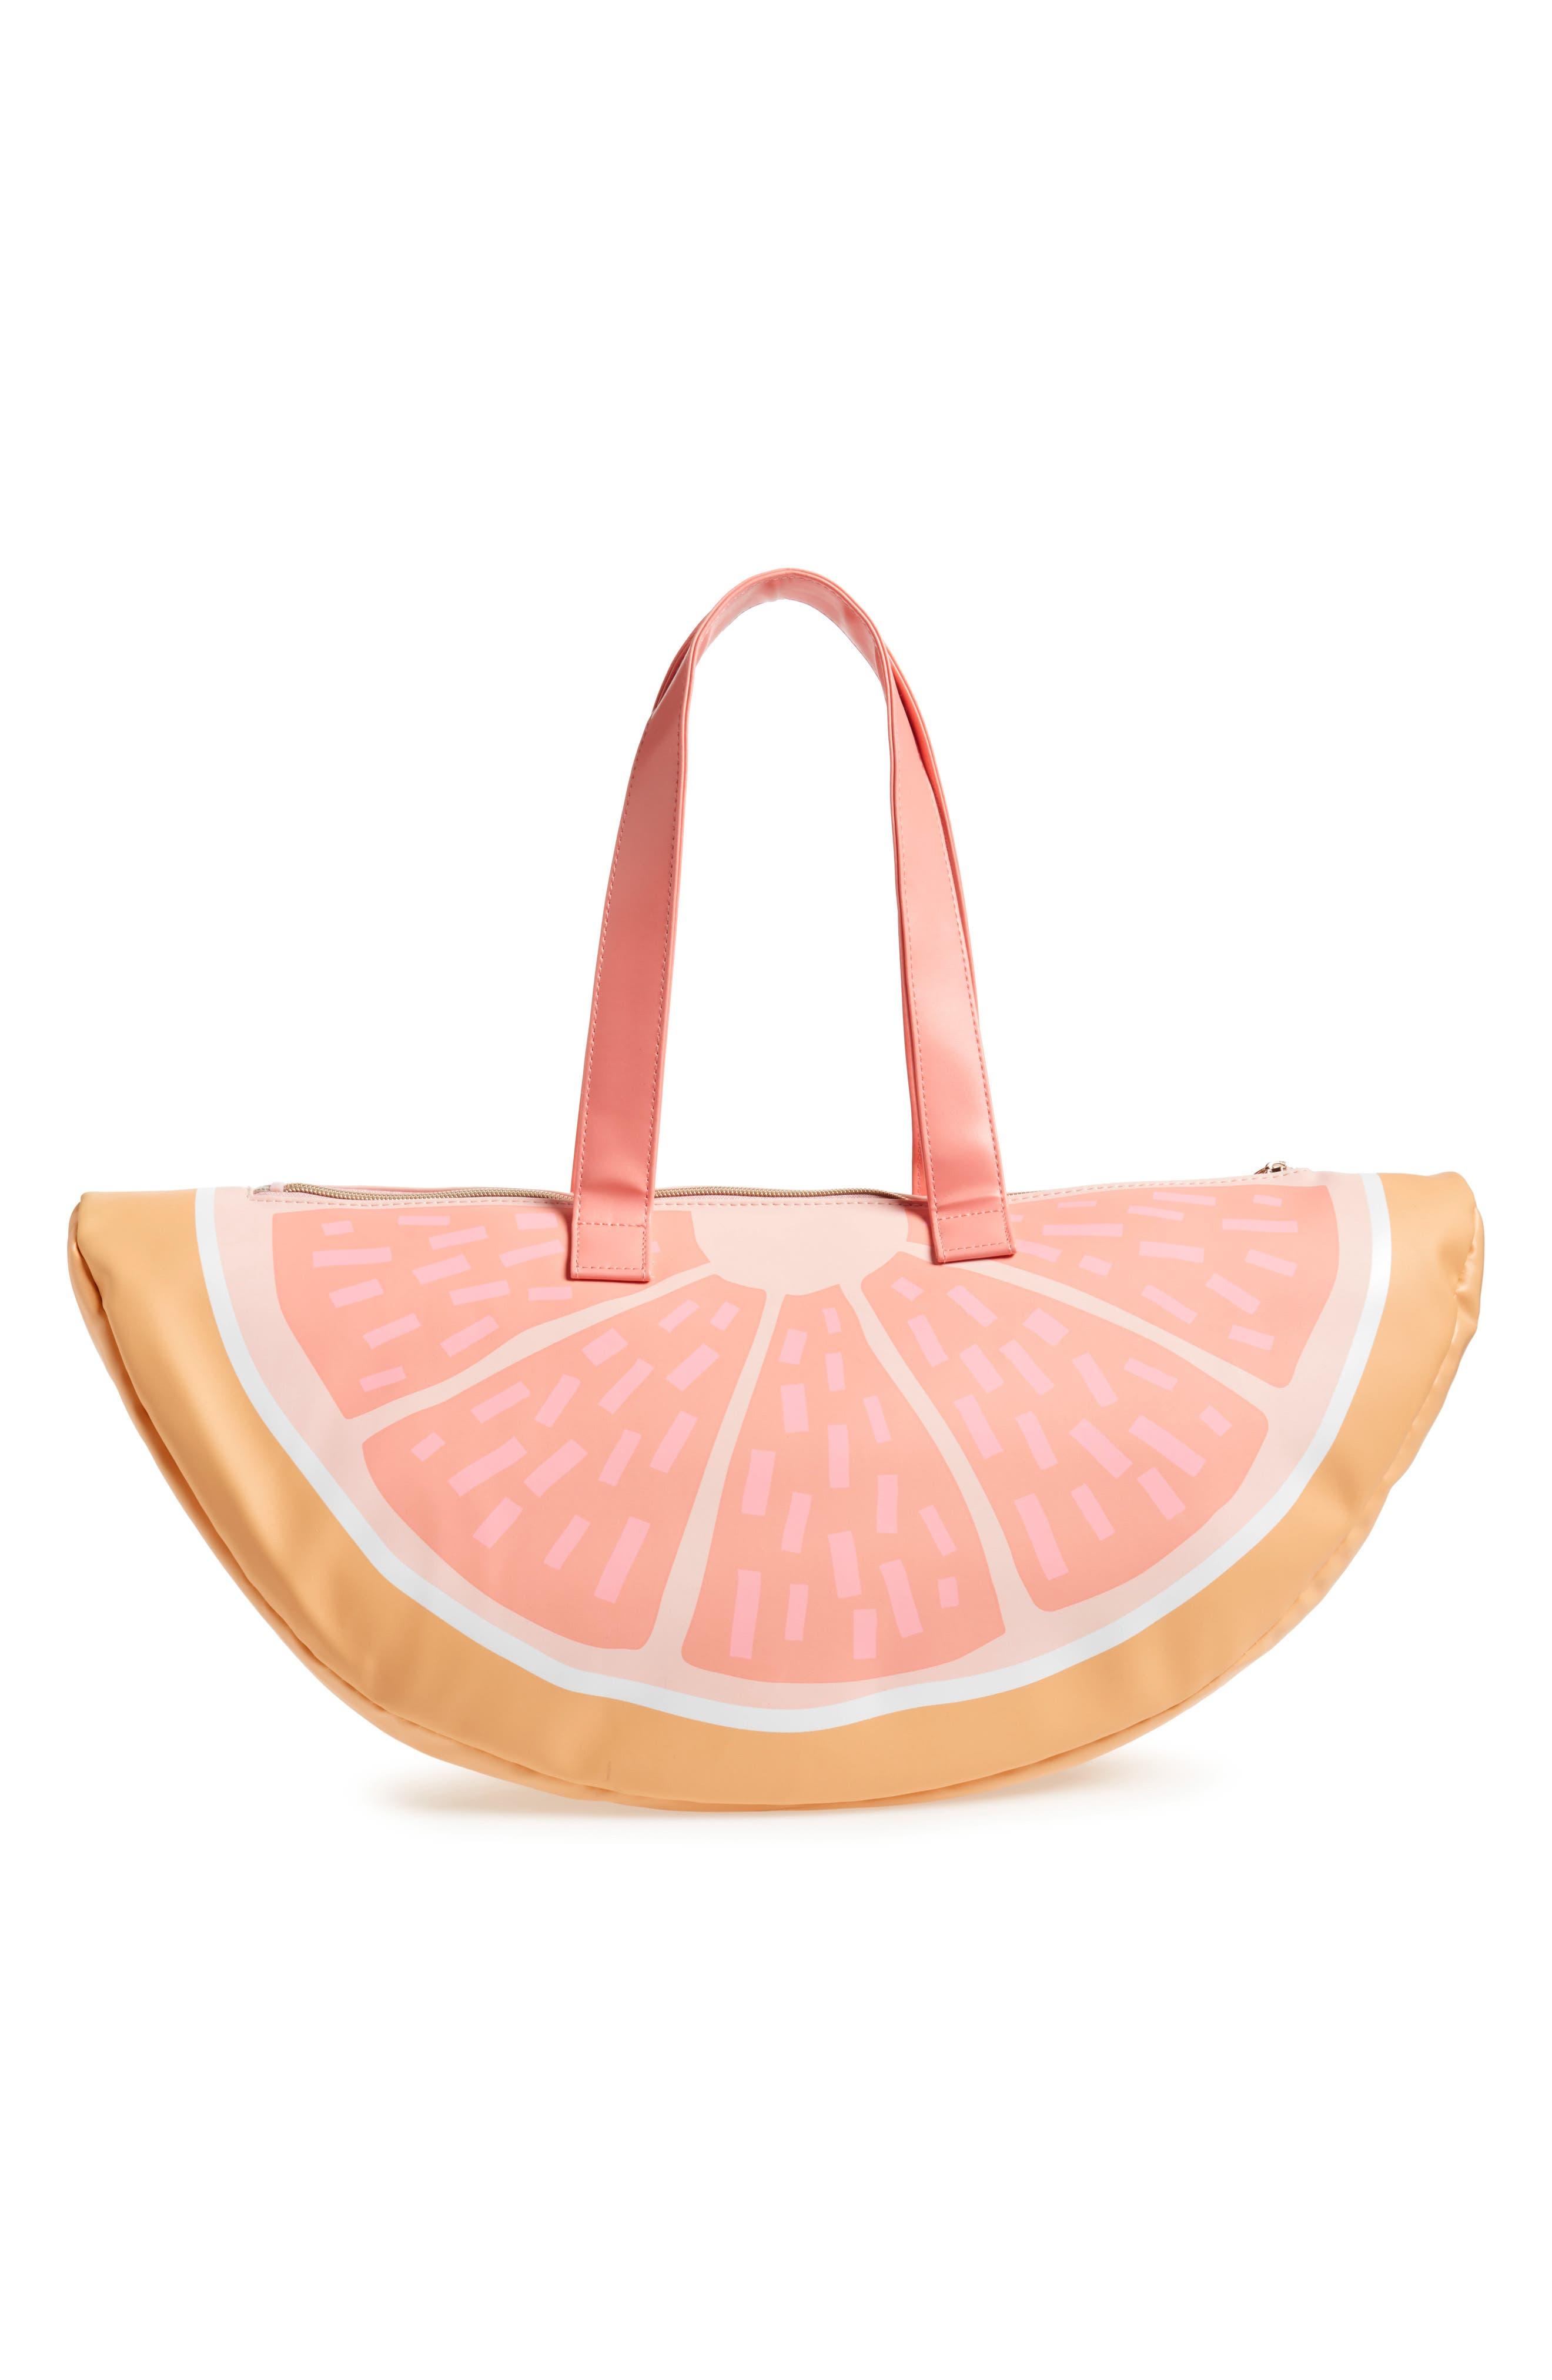 Grapefruit Cooler Bag,                             Alternate thumbnail 3, color,                             950